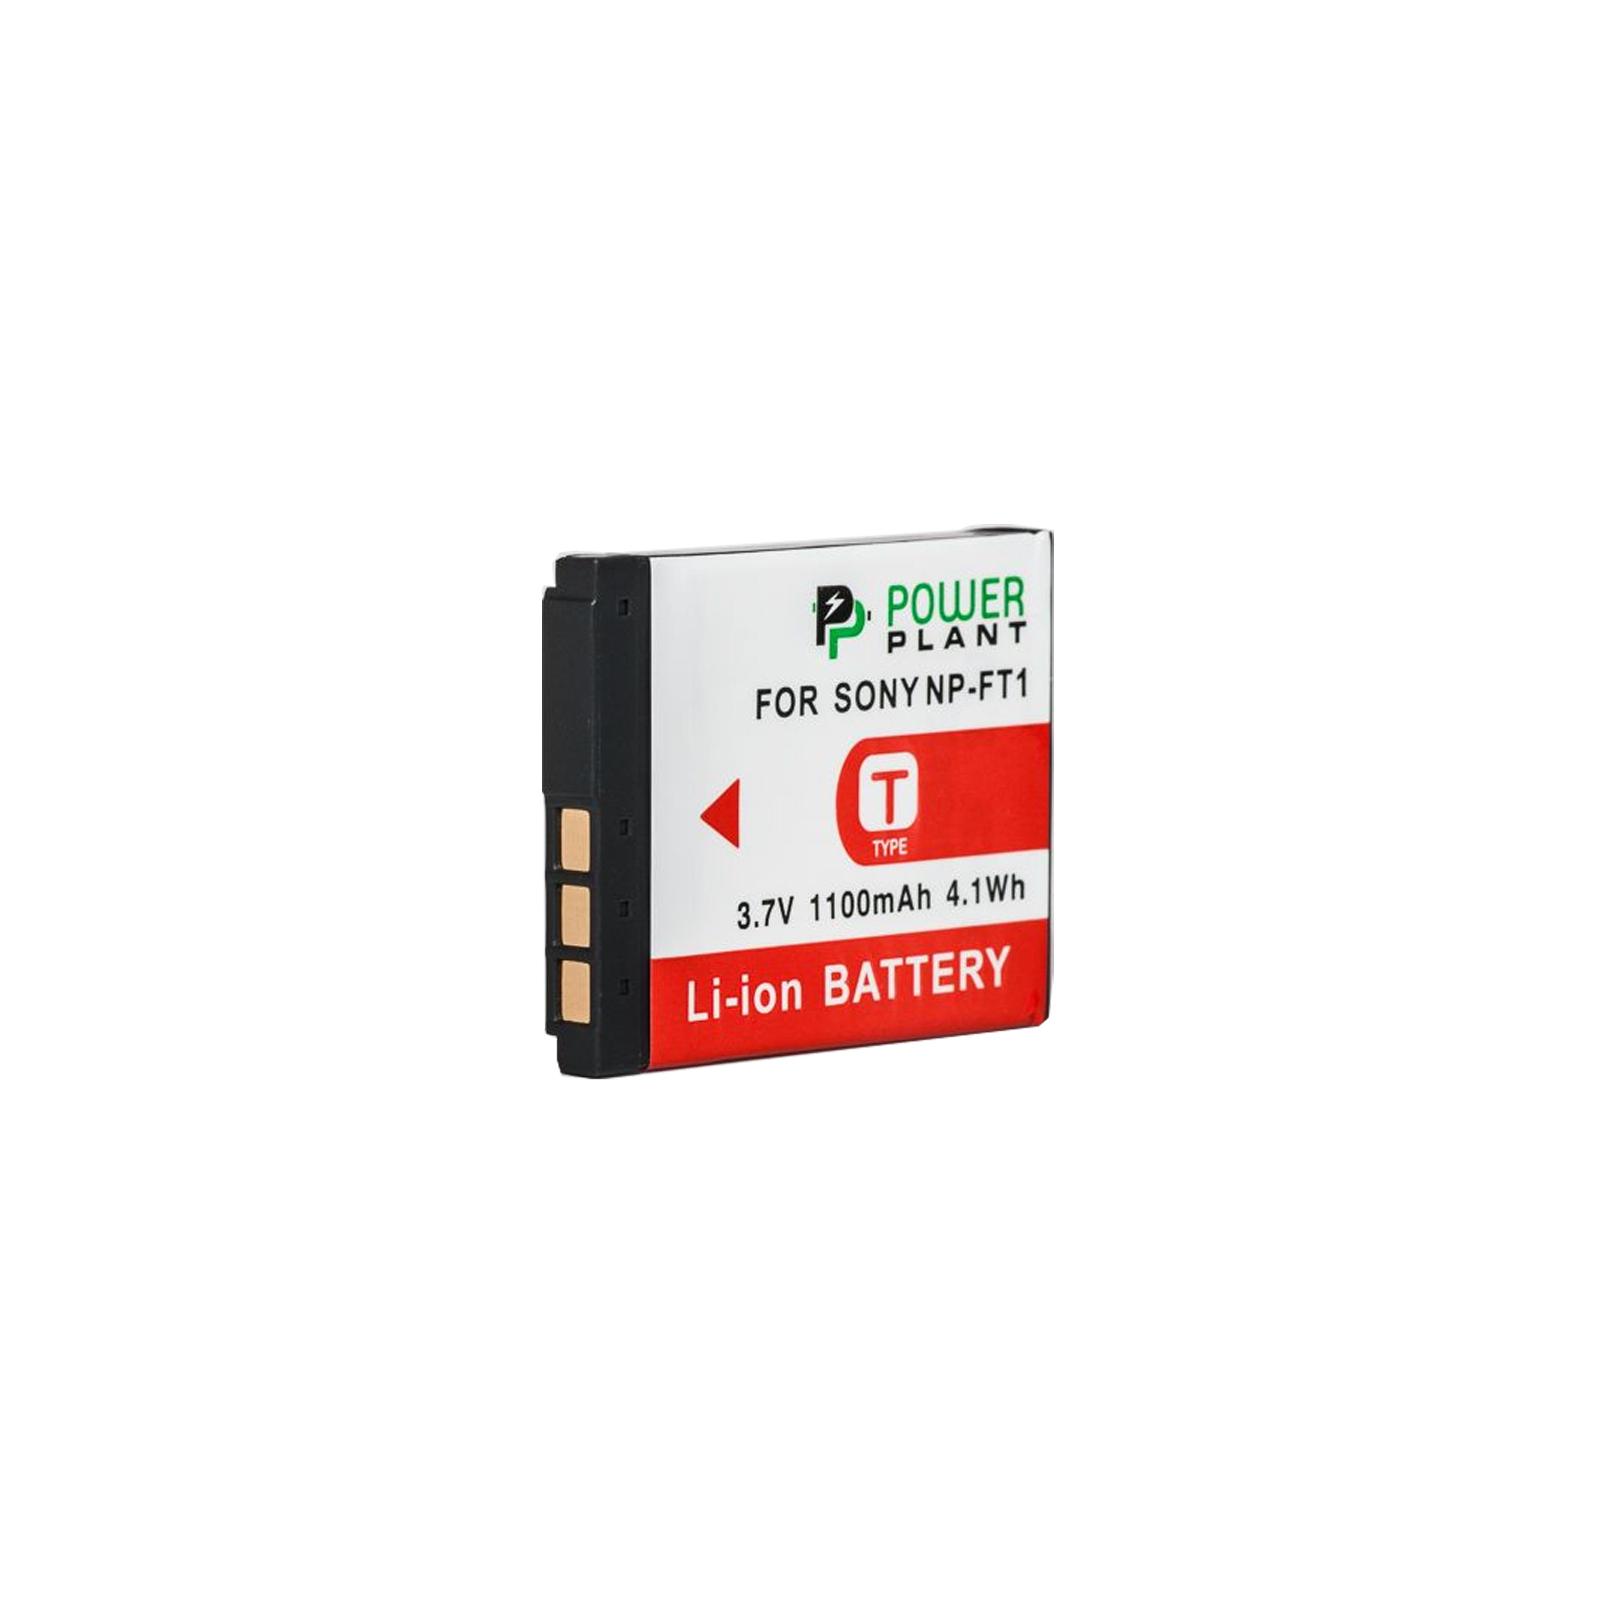 Аккумулятор к фото/видео PowerPlant Sony NP-FT1 (DV00DV1020)